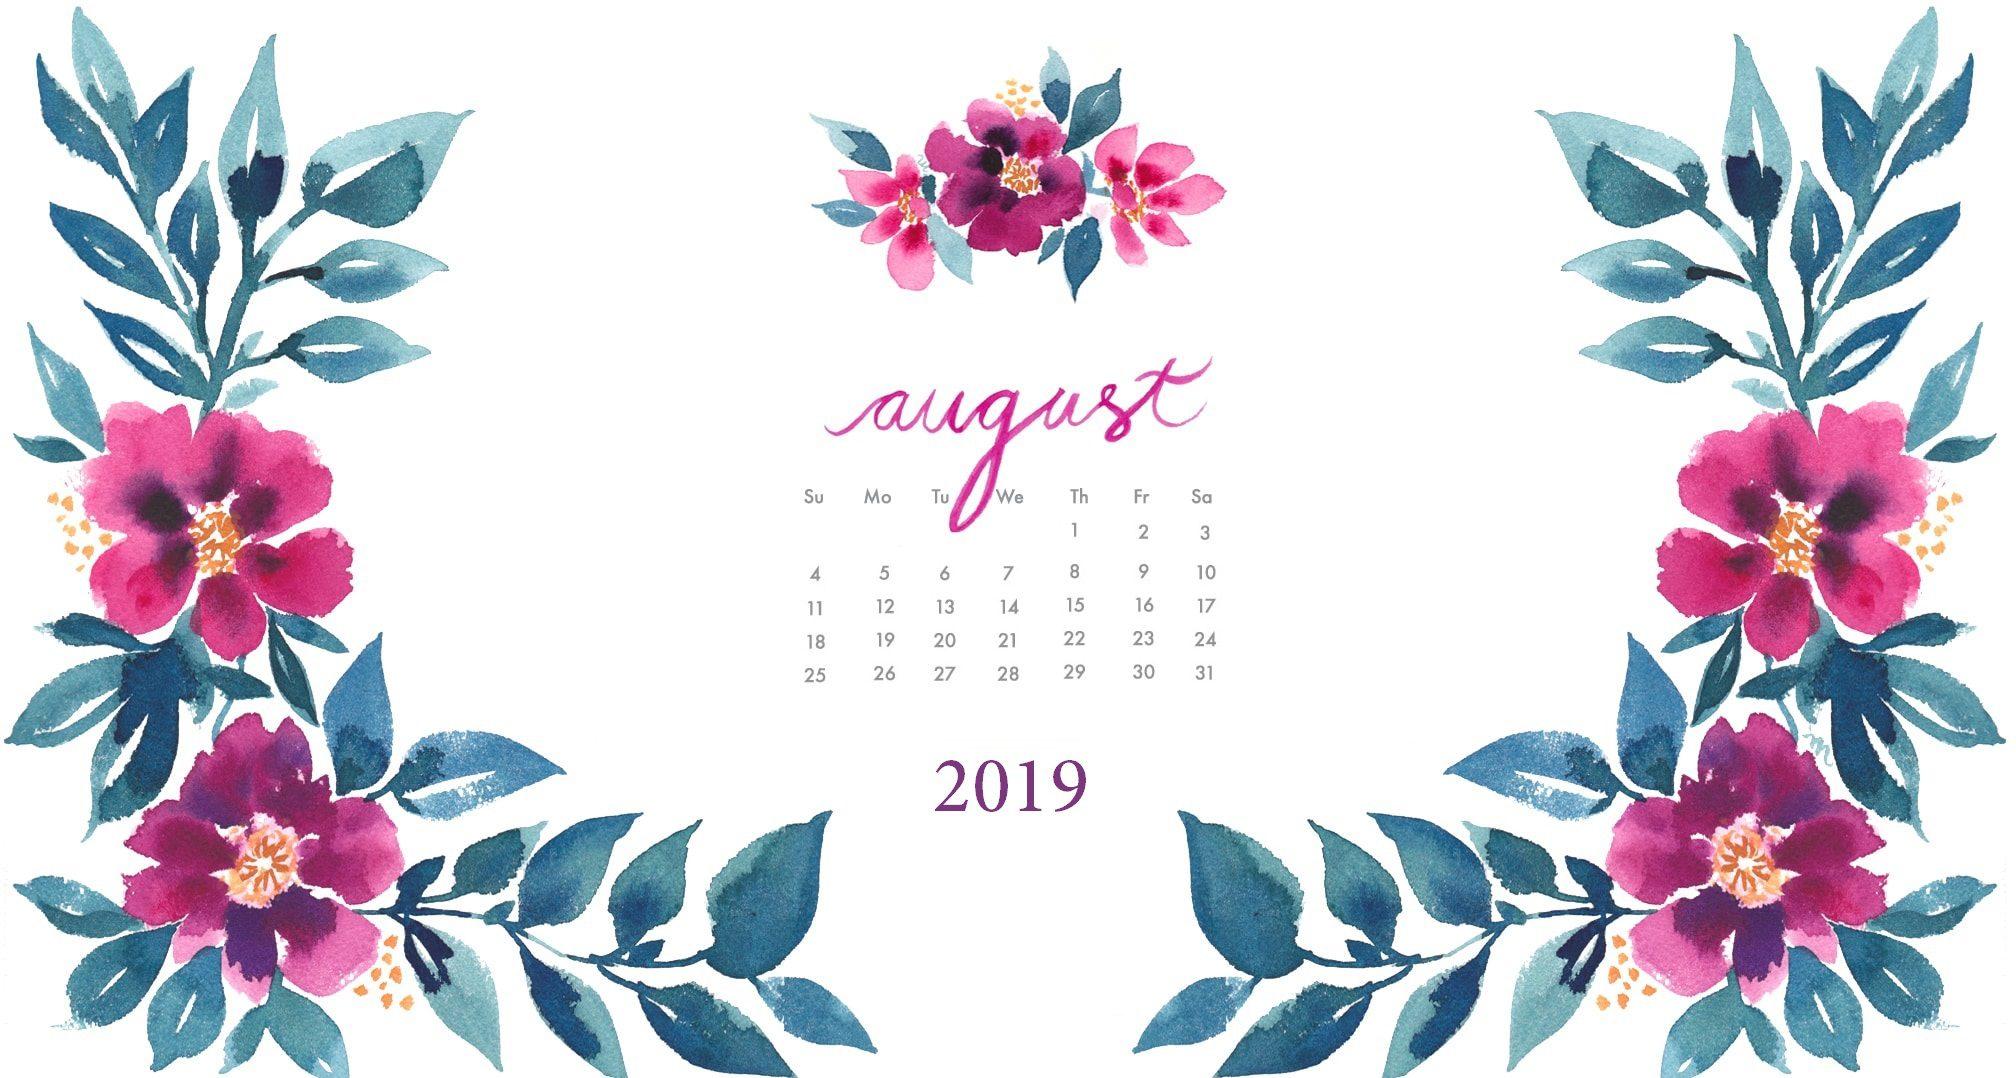 August 2019 Floral Desktop Wallpaper